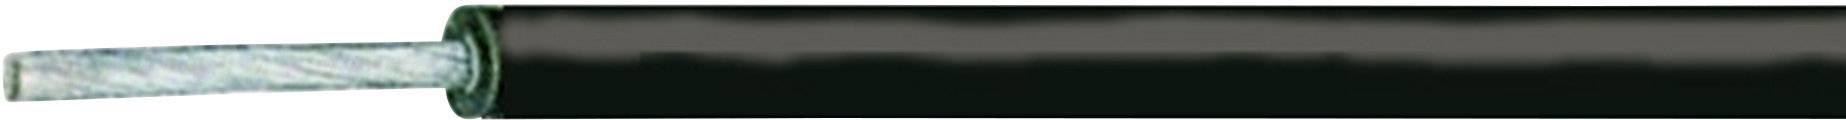 Licna XBK Kabel SiL-SiAF, 1x 2,50 mm², silikon, Ø 3 mm, 1 m, černá